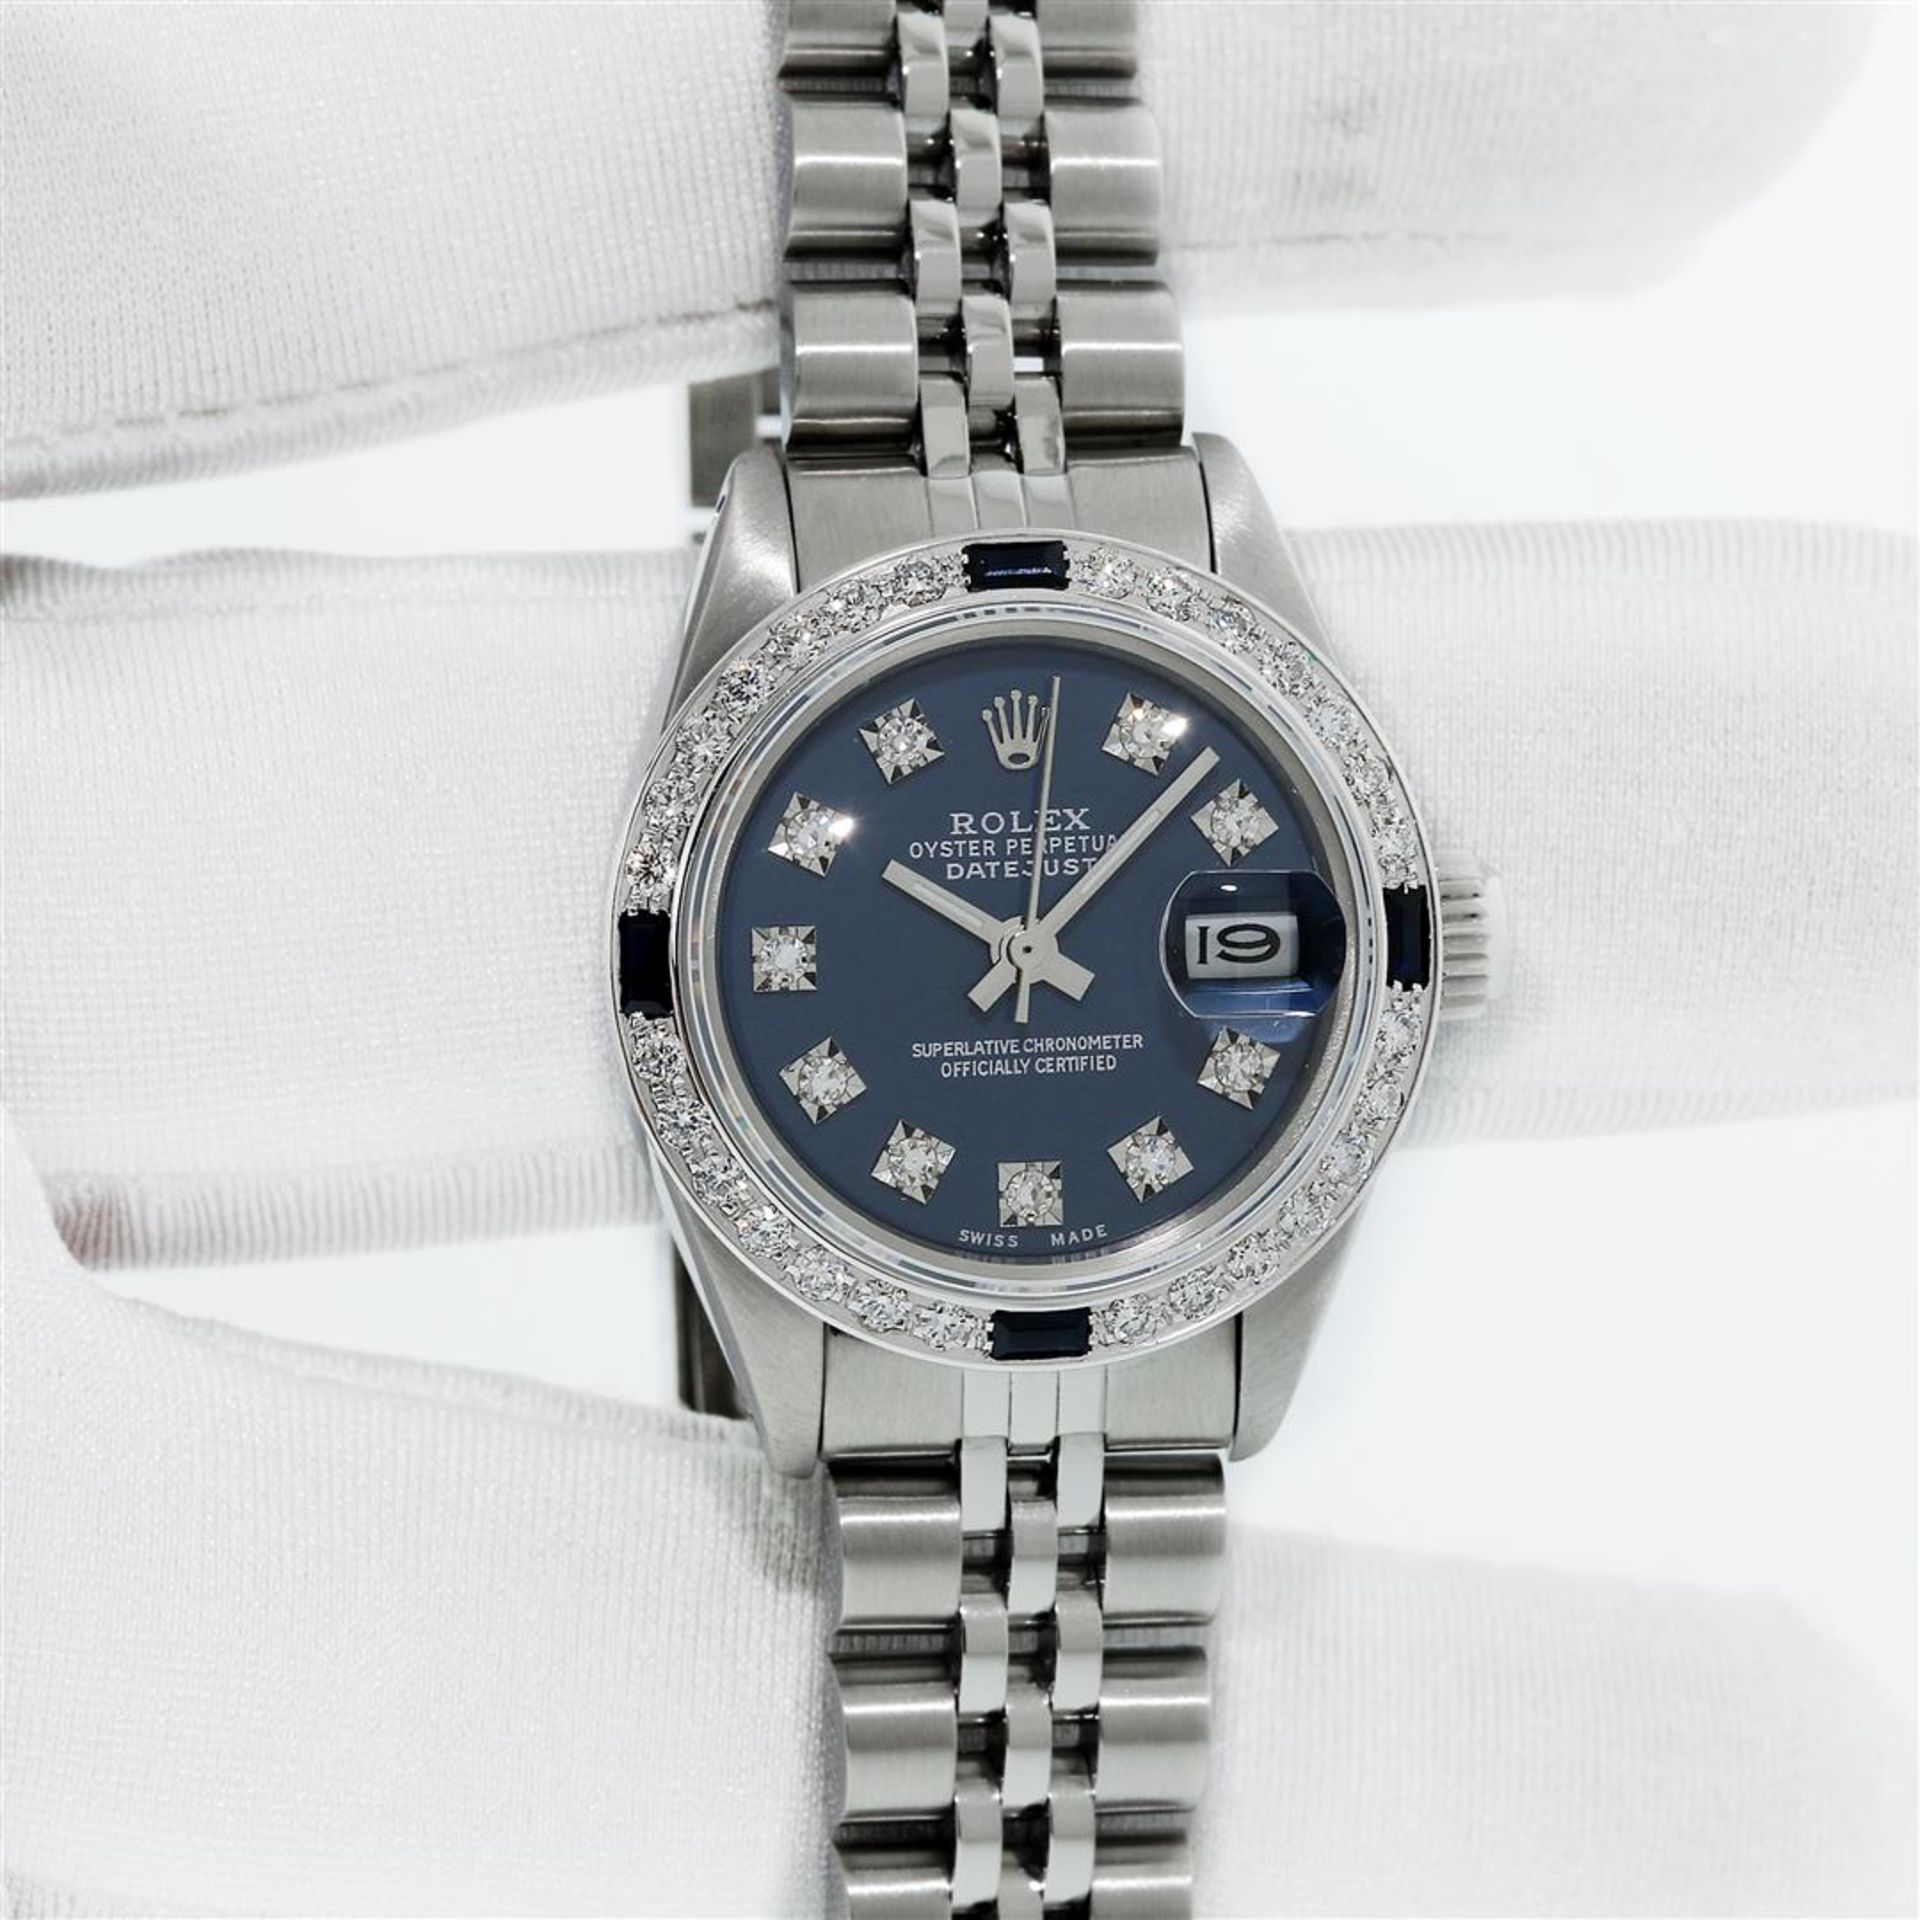 Rolex Ladies Stainless Steel Blue VVS Diamond & Sapphire Datejust Wristwatch - Image 3 of 9